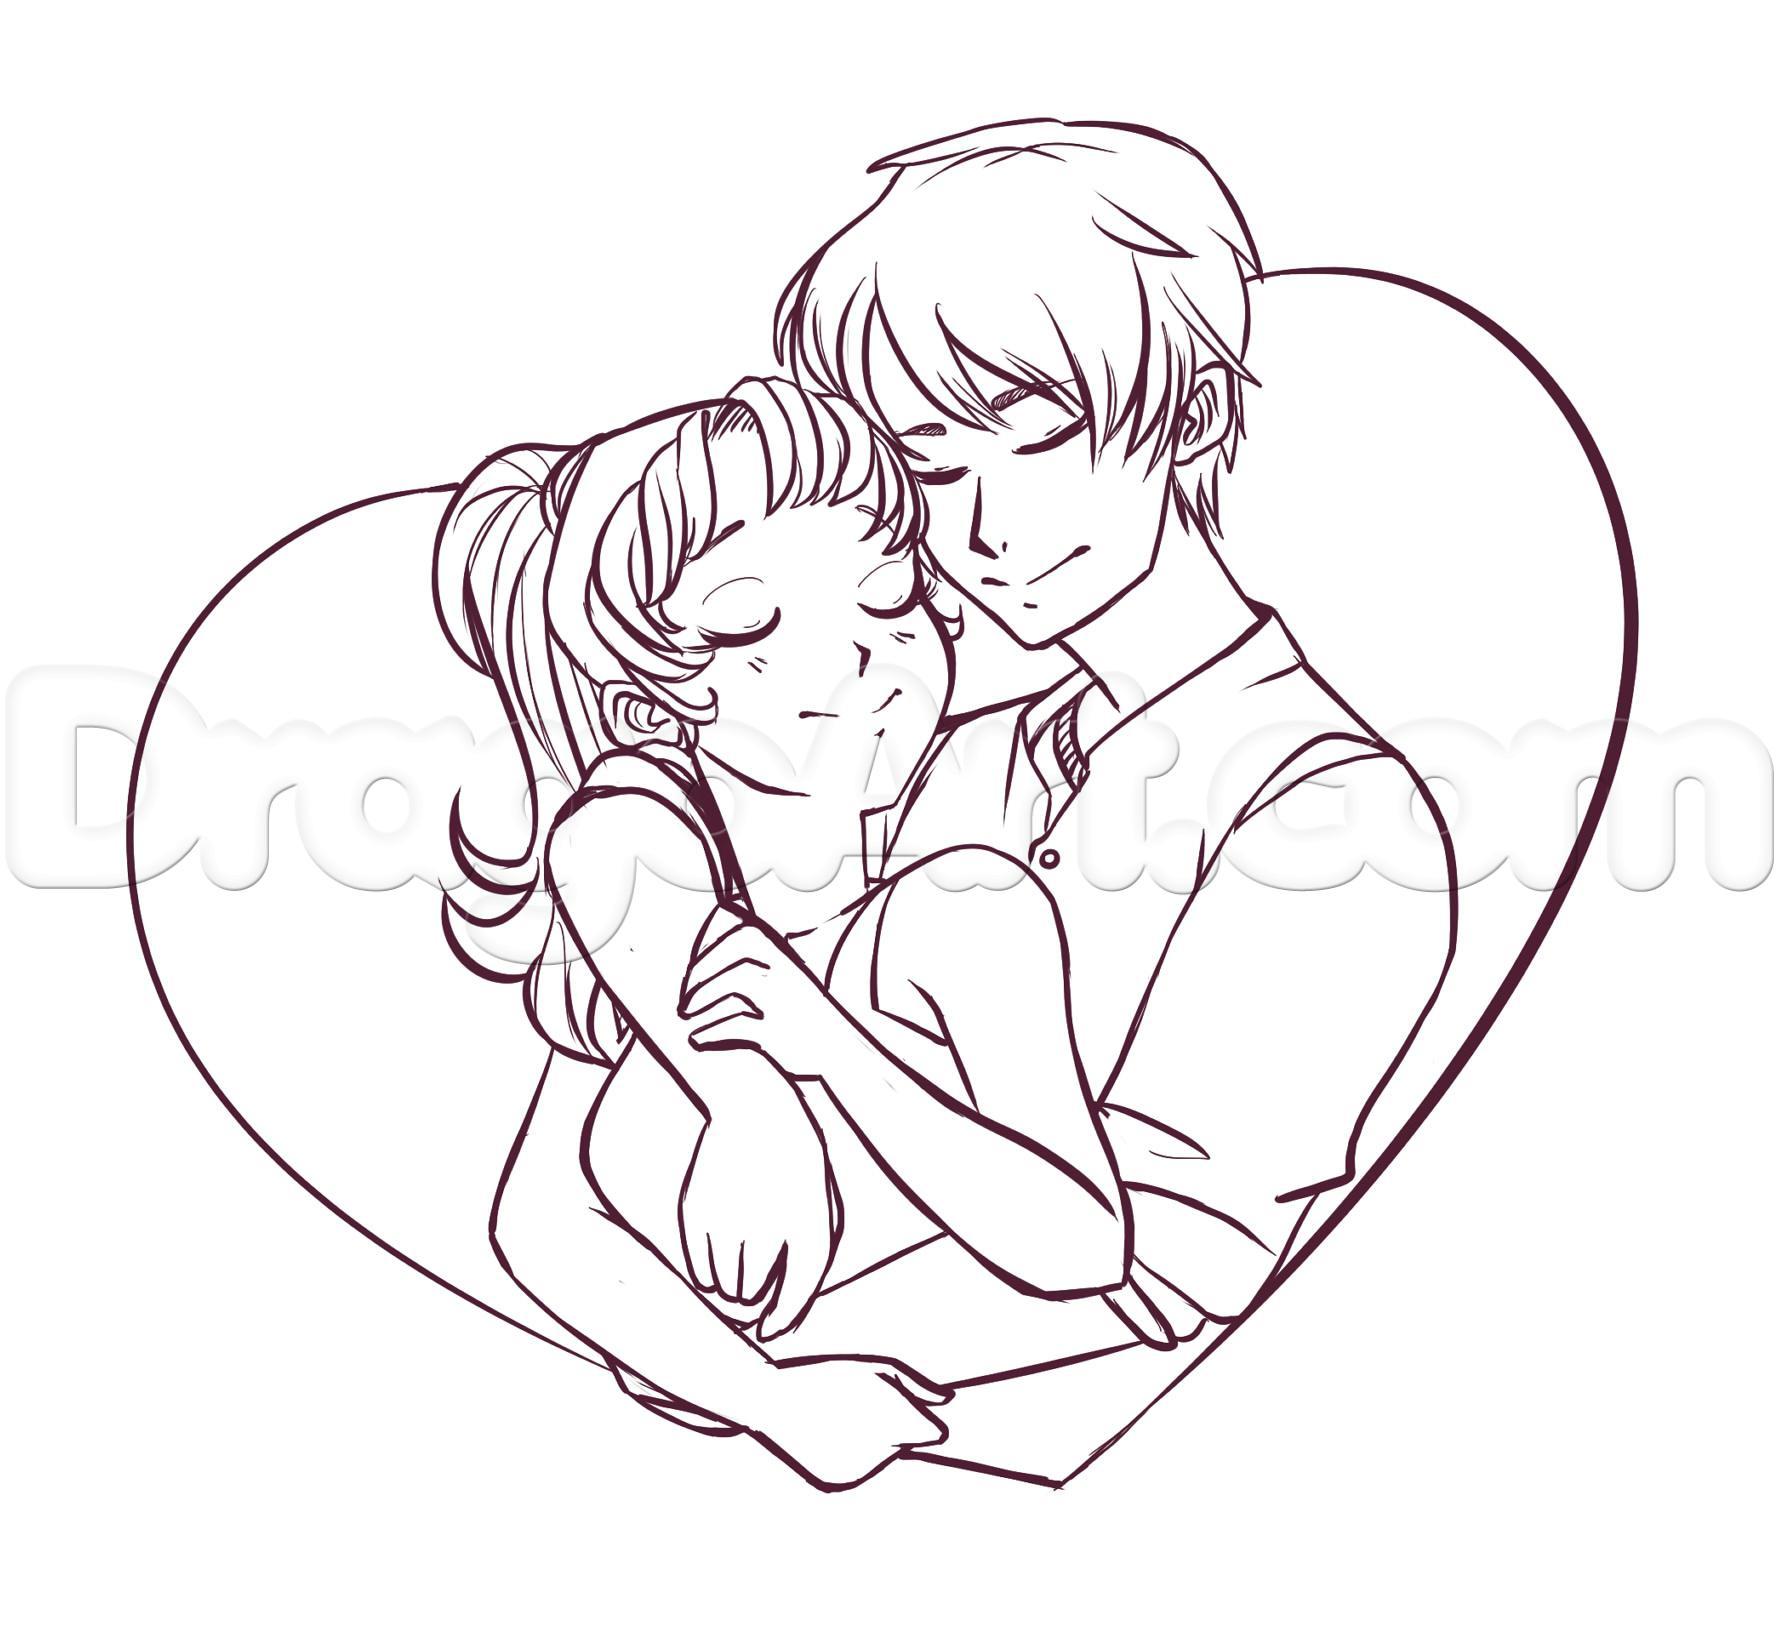 1779x1627 Simple Drawings Of Loving Huggings How To Draw An Anime Hug Step 8